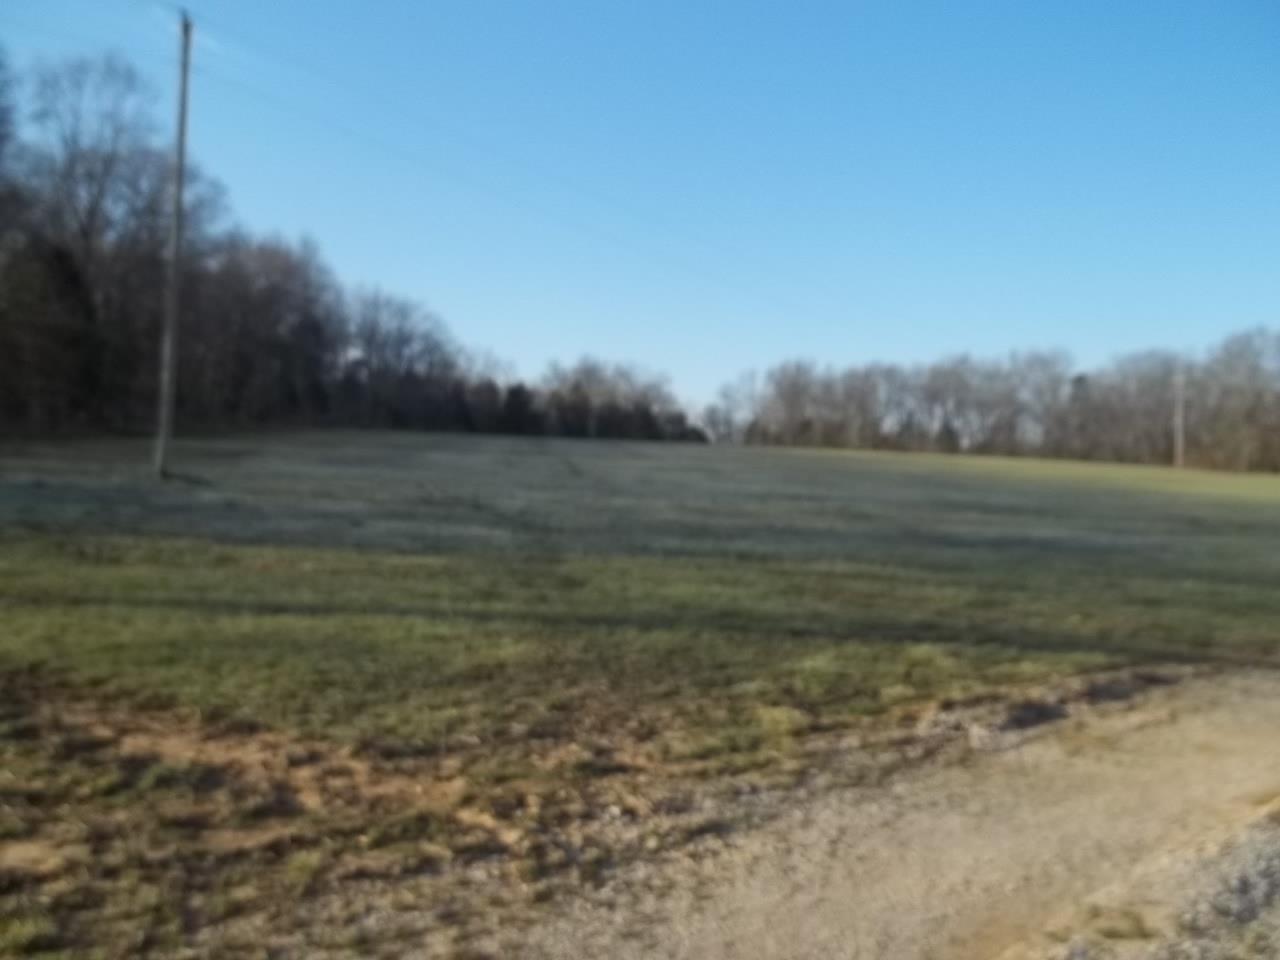 2145 Palmetto Cemetery Rd, Lewisburg, TN 37091 - Lewisburg, TN real estate listing